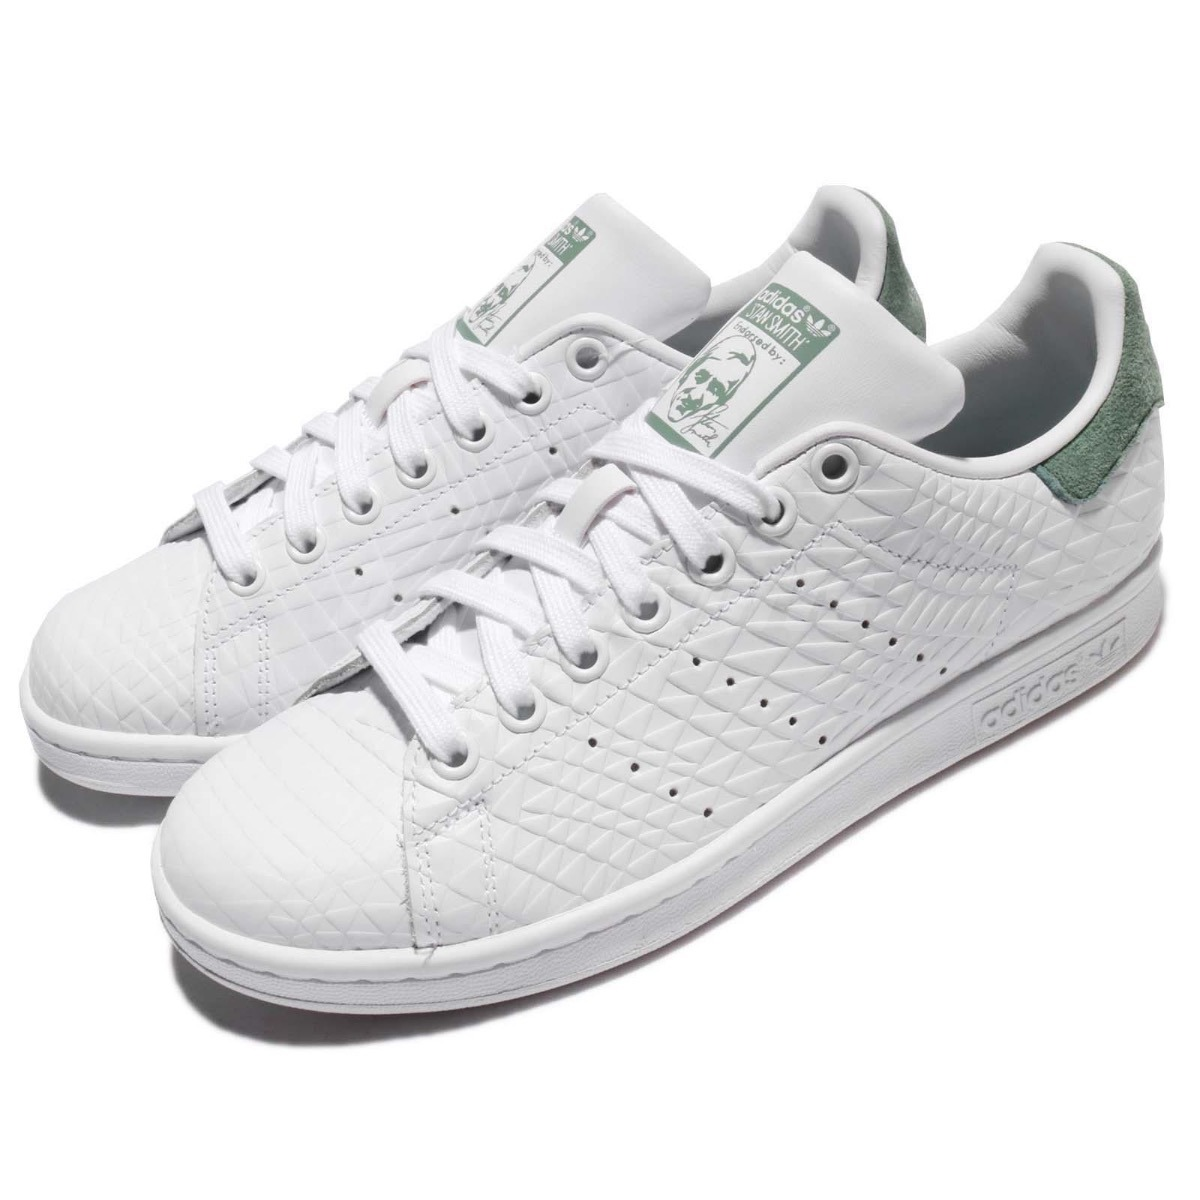 249dd214891 ... usa tenis adidas stan smith blanco mujer bz0409 look trendy. cargando  zoom. 82c22 595d3